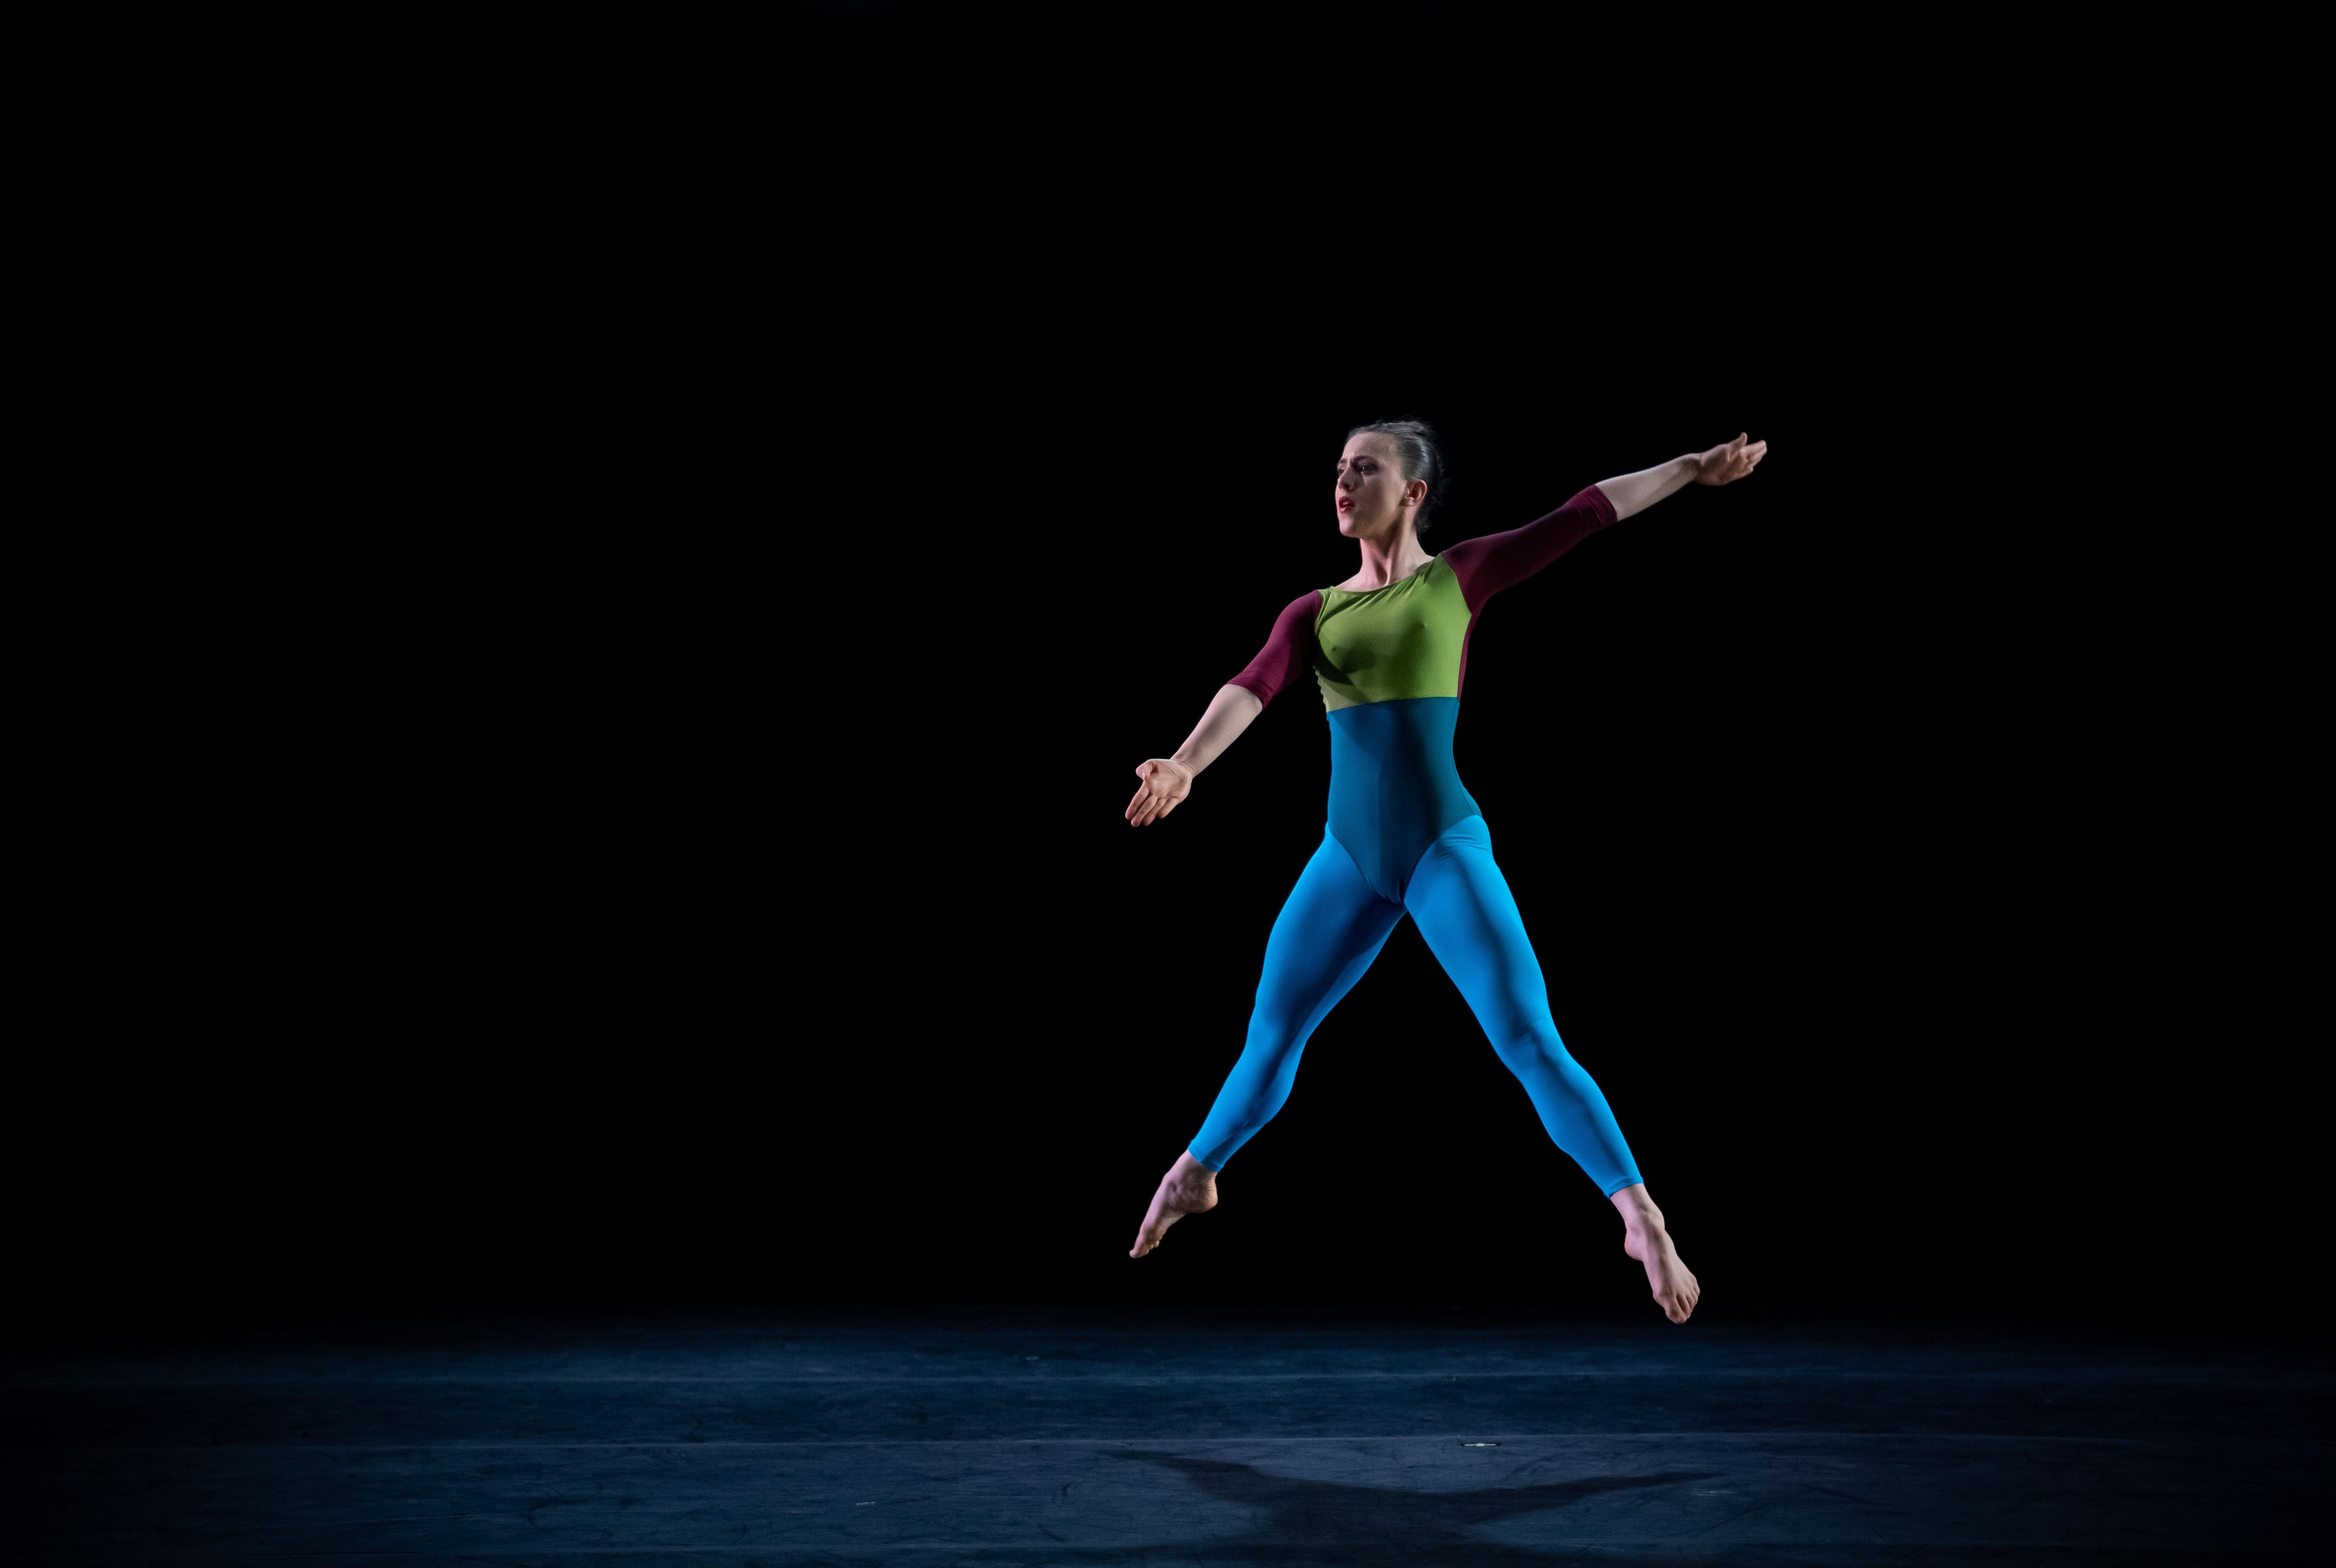 DanceDanceDance2-VarennaRavenna-8